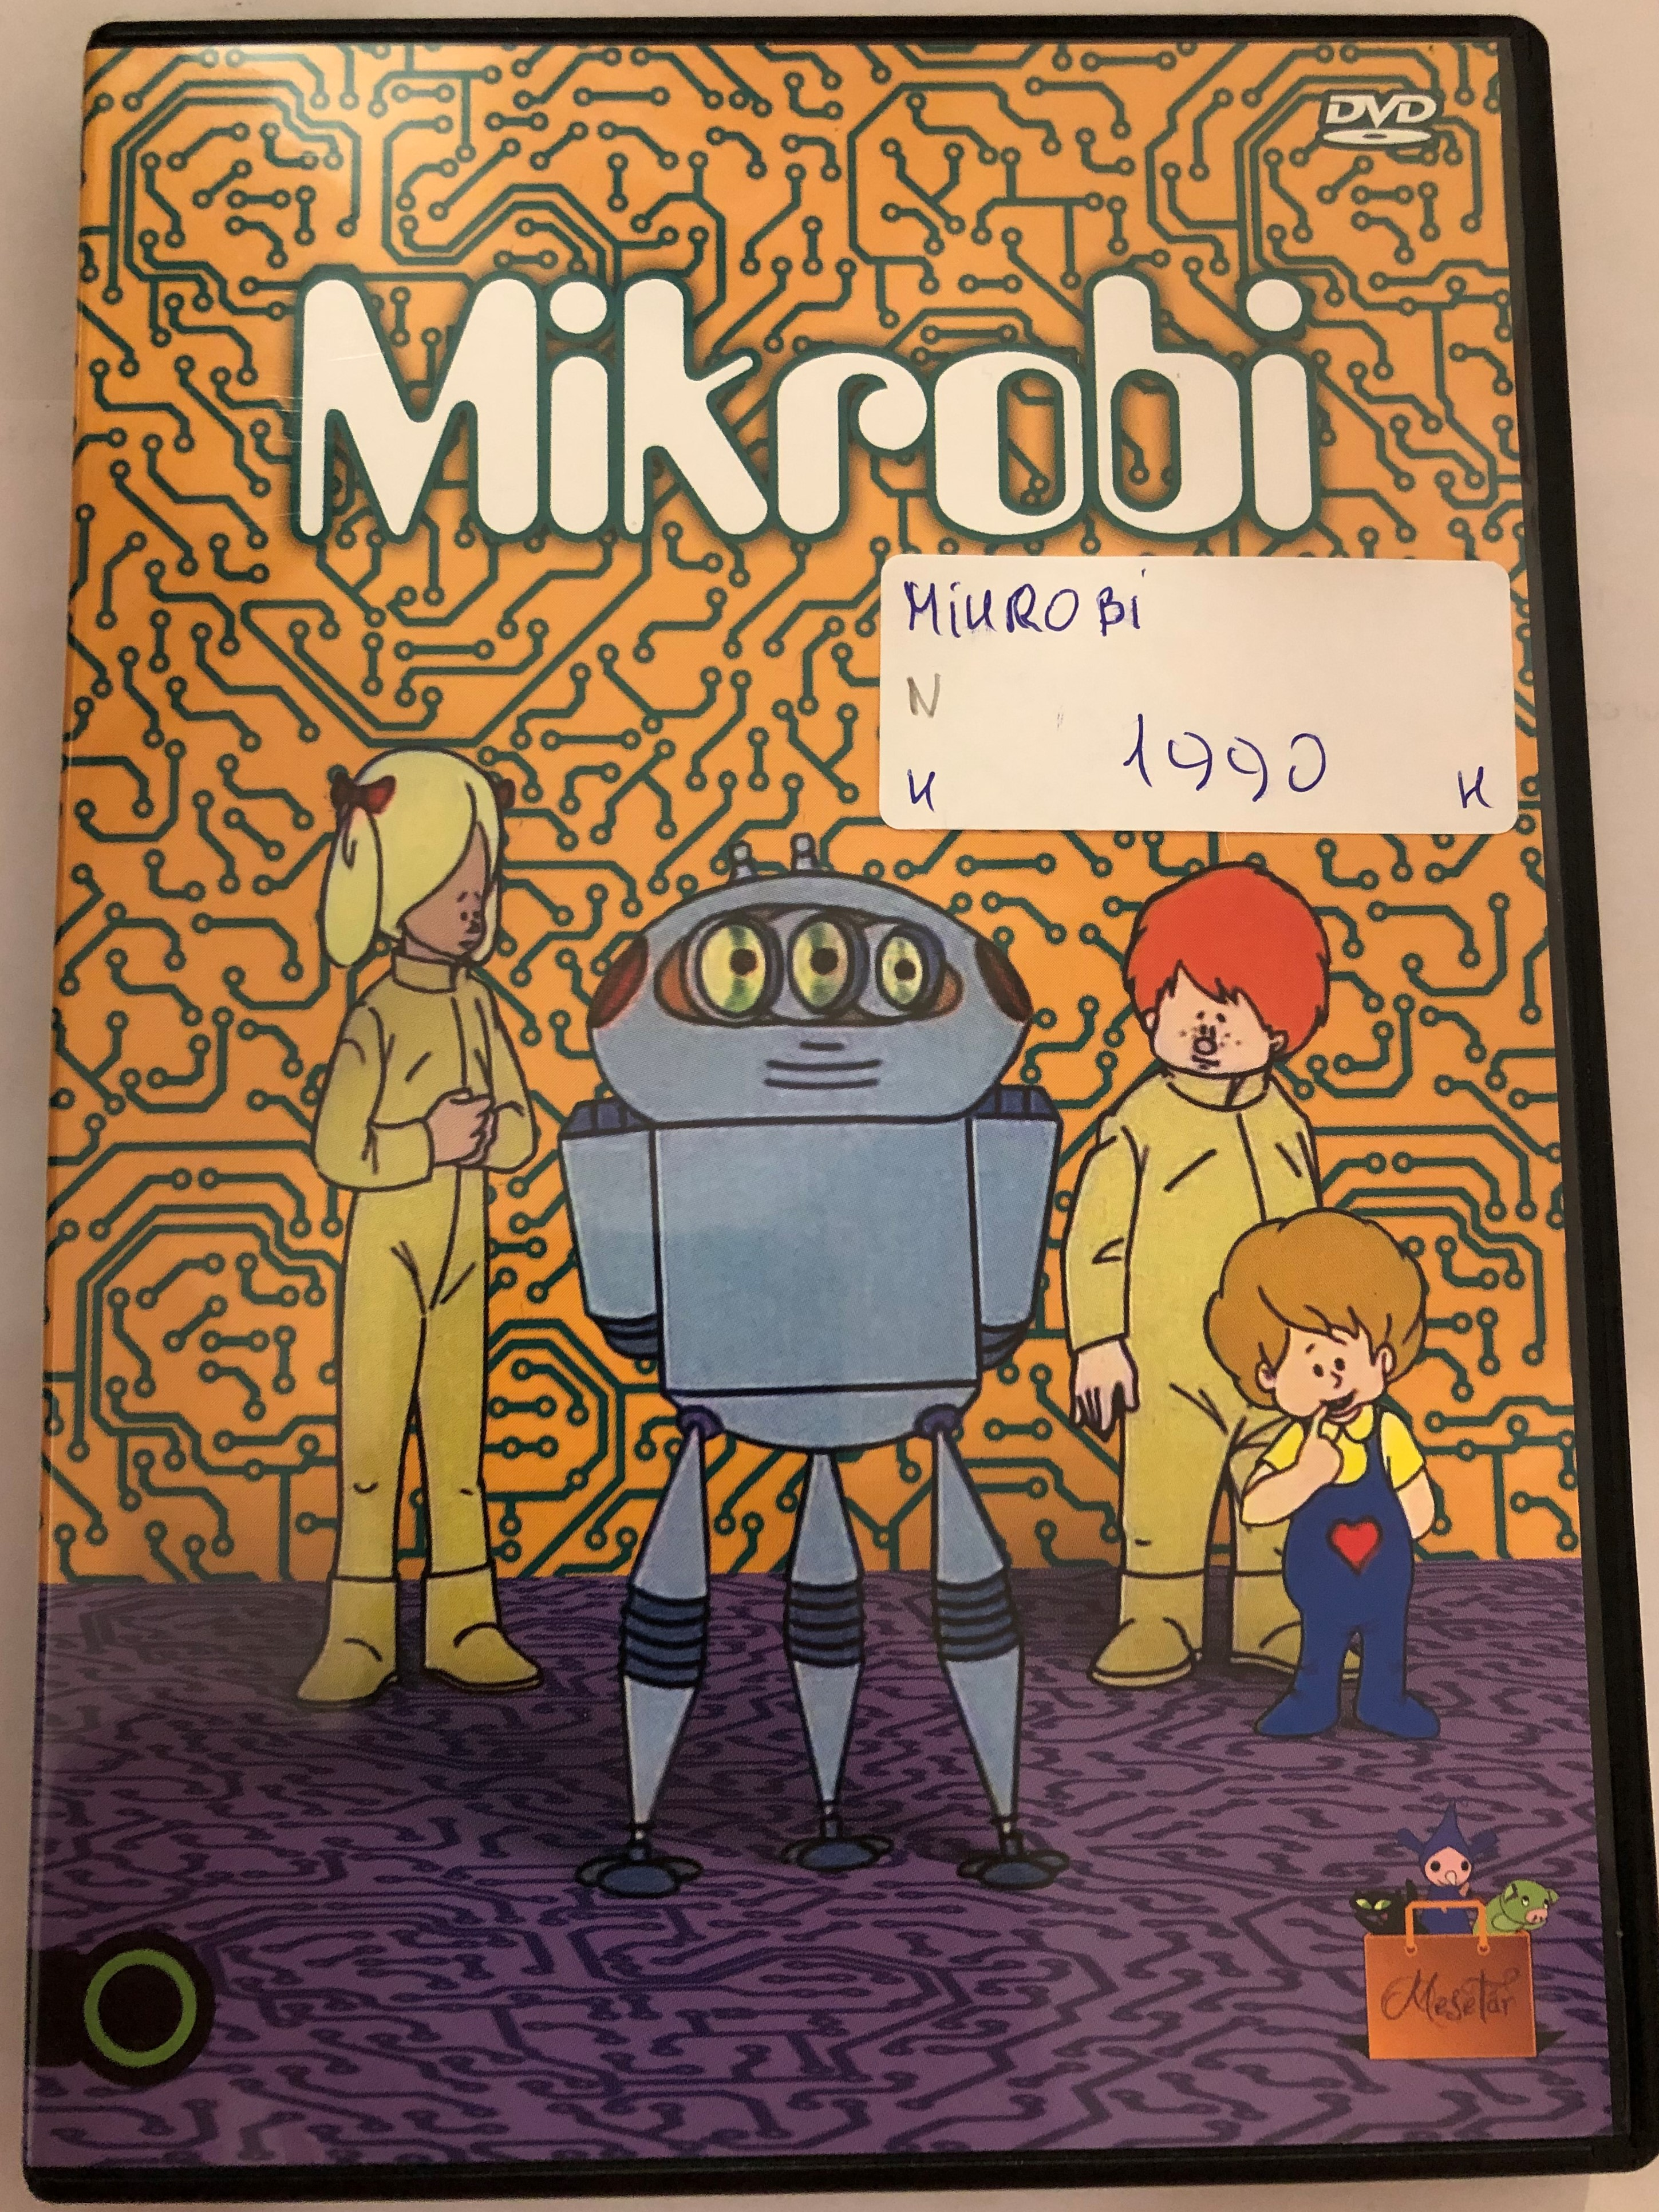 mikrobi-dvd-1975-directed-by-mata-j-nos-1.jpg